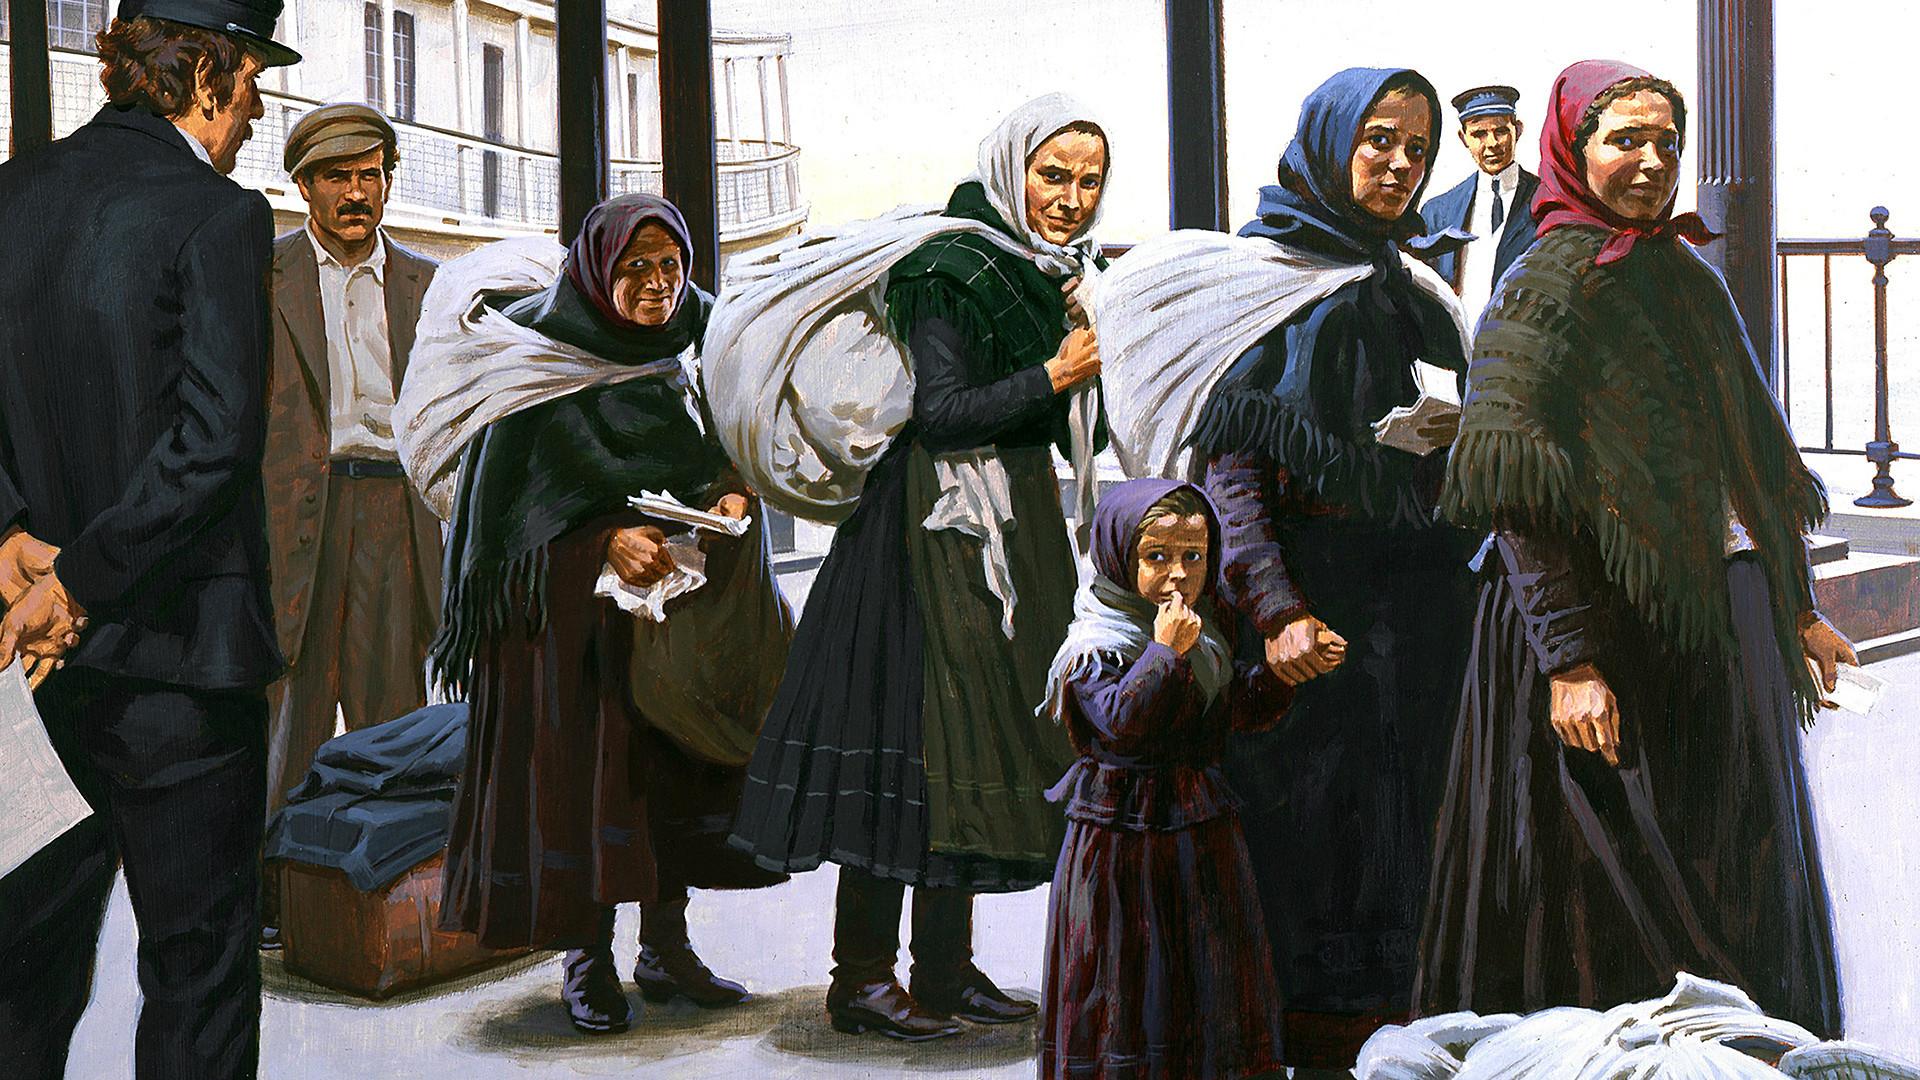 Peinture représentant des immigrants russes arrivant à Ellis Island vers 1900.